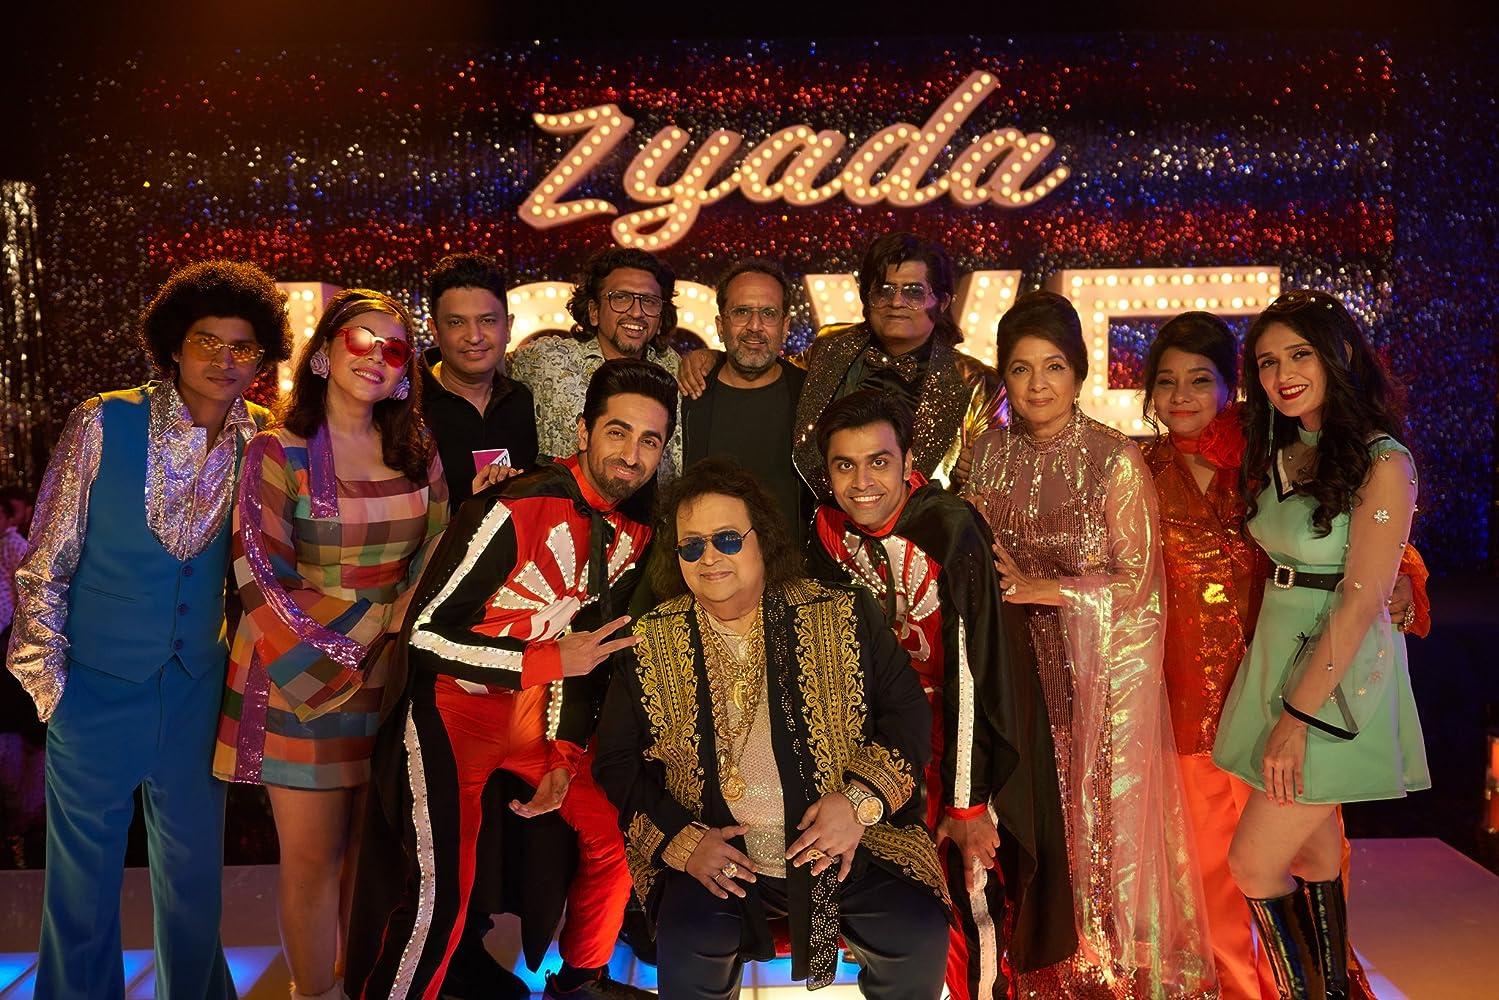 Shubh Mangal Zyada Saavdhan (2020) Film Indian Online